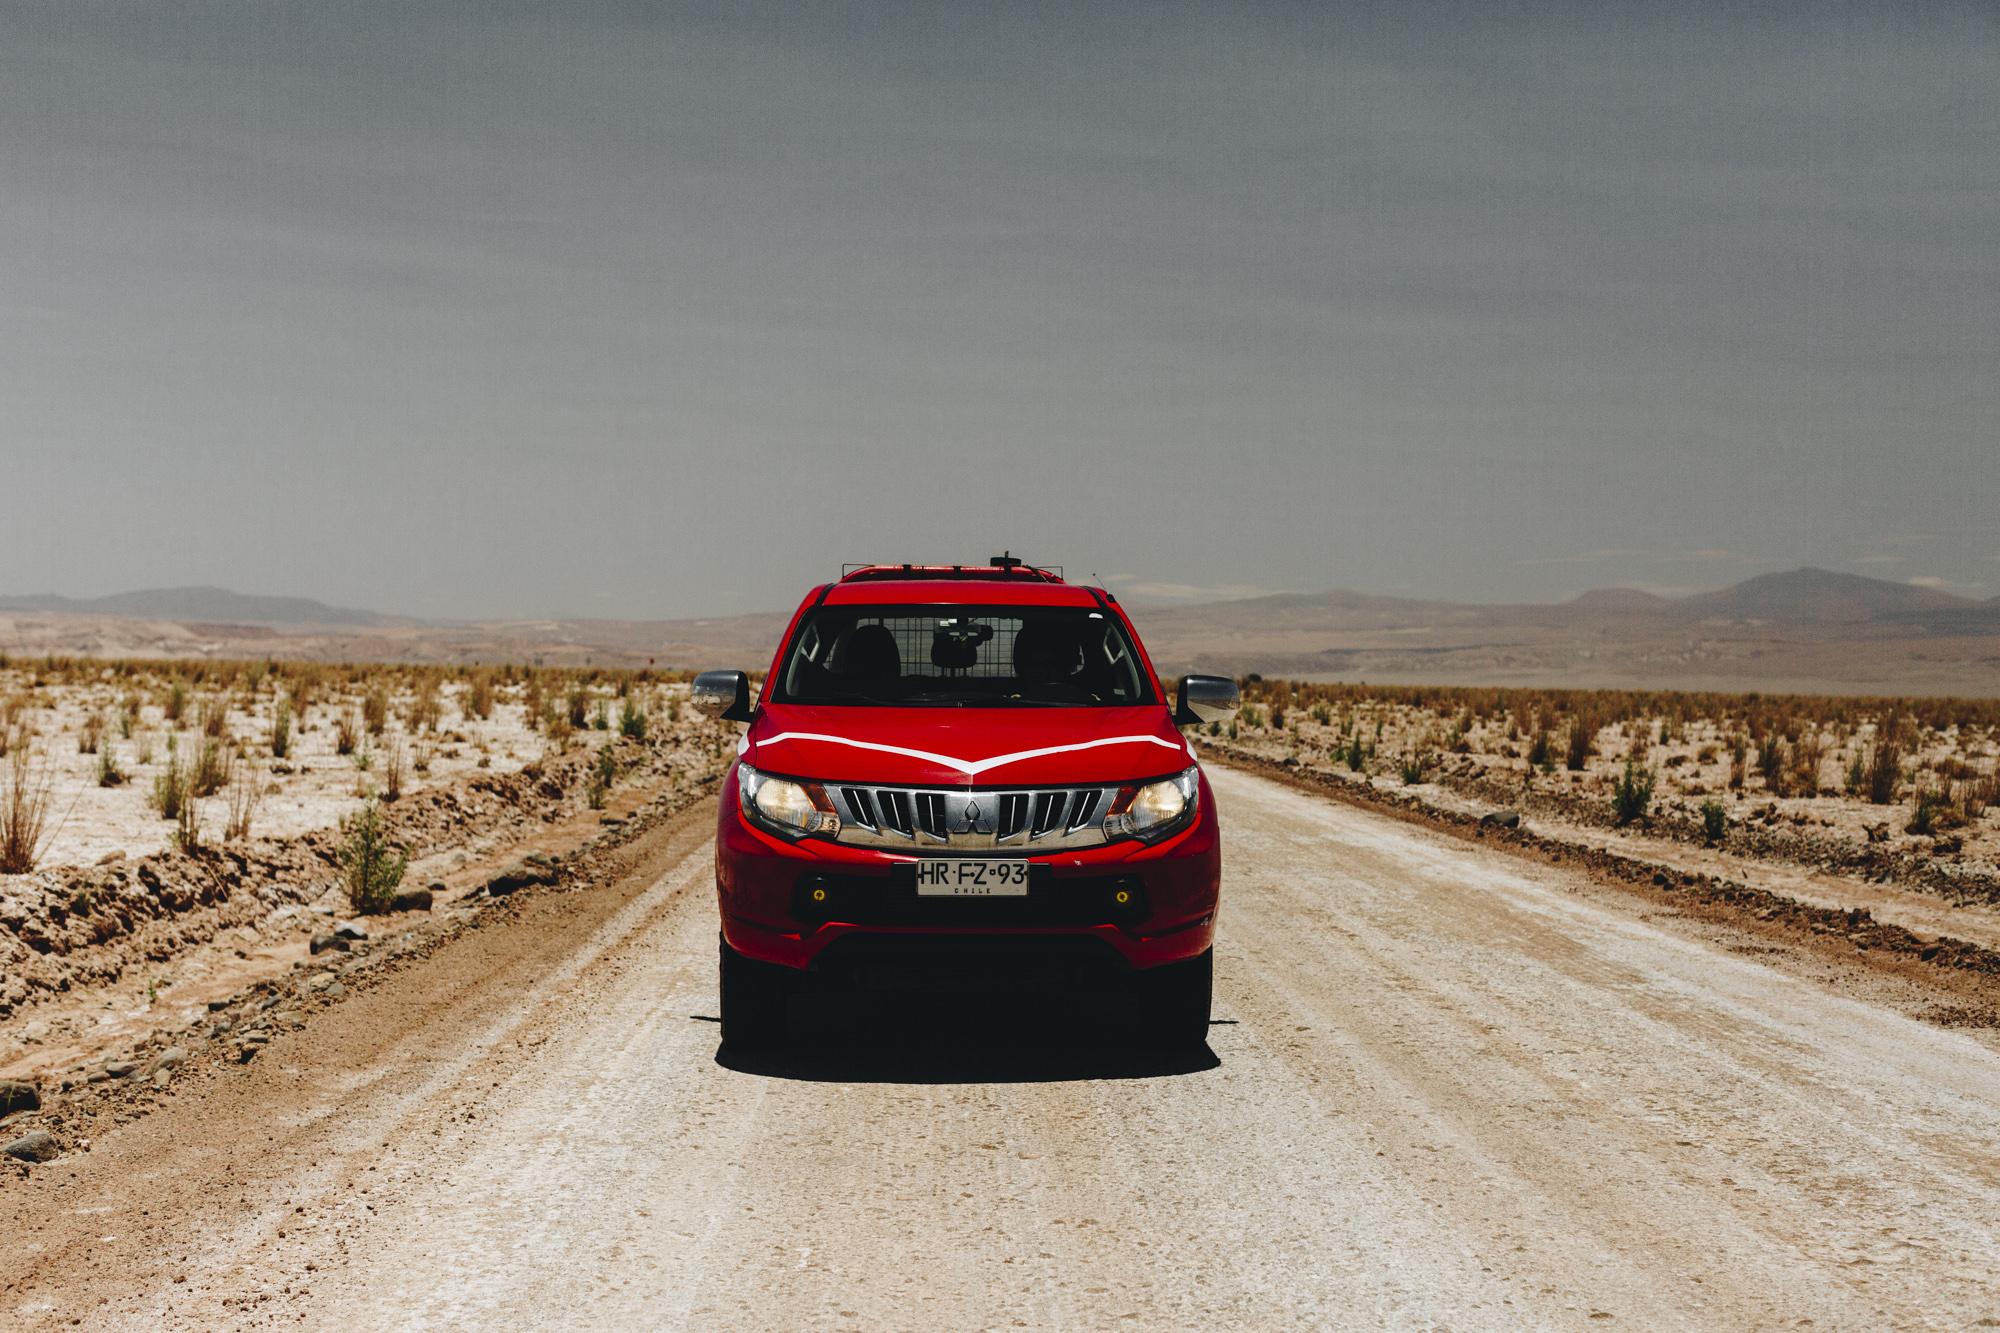 Mael Lambla photographer Chile San pedro atacama desert-70.jpg